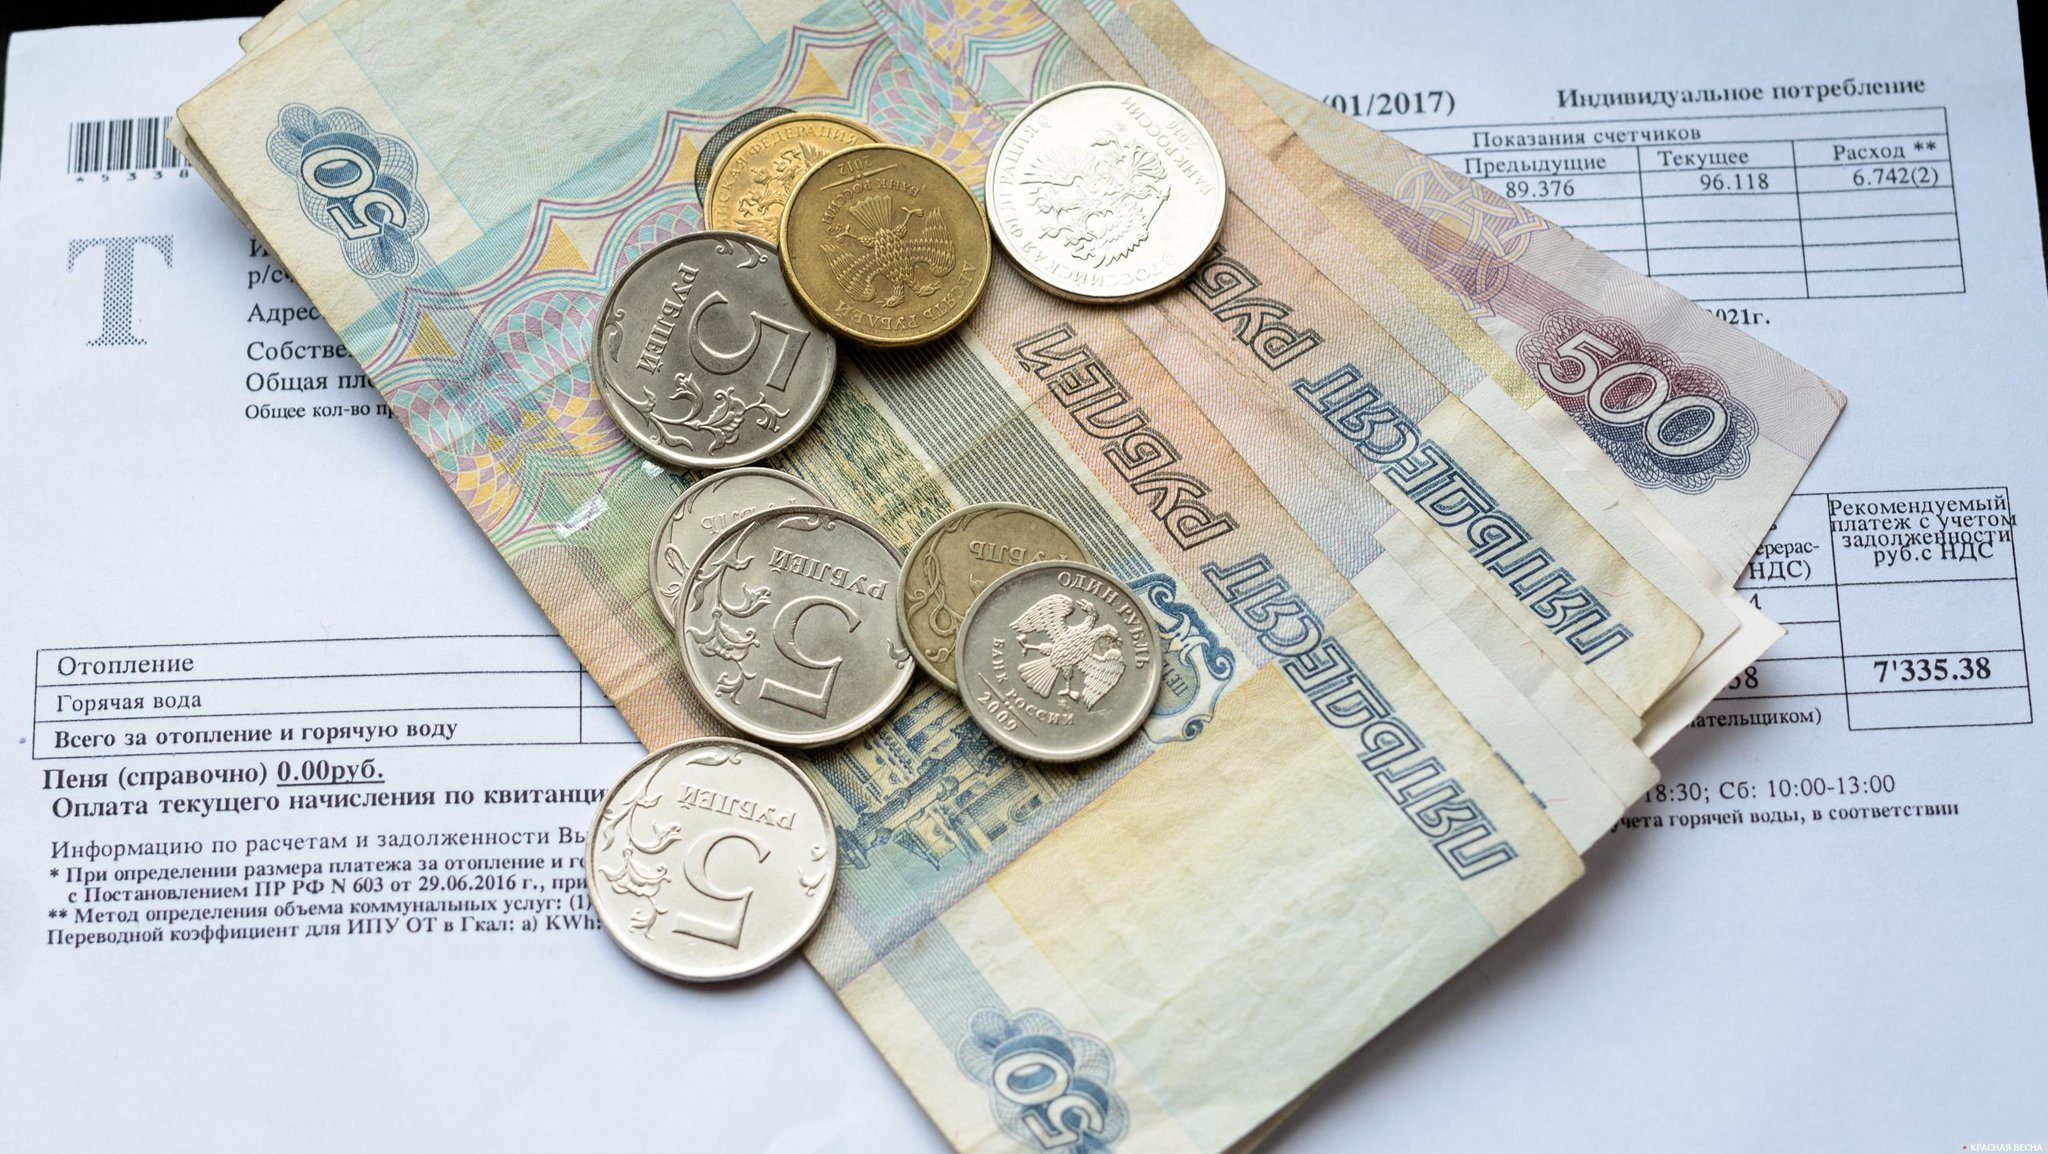 Кто выдает паспорта в казахстане